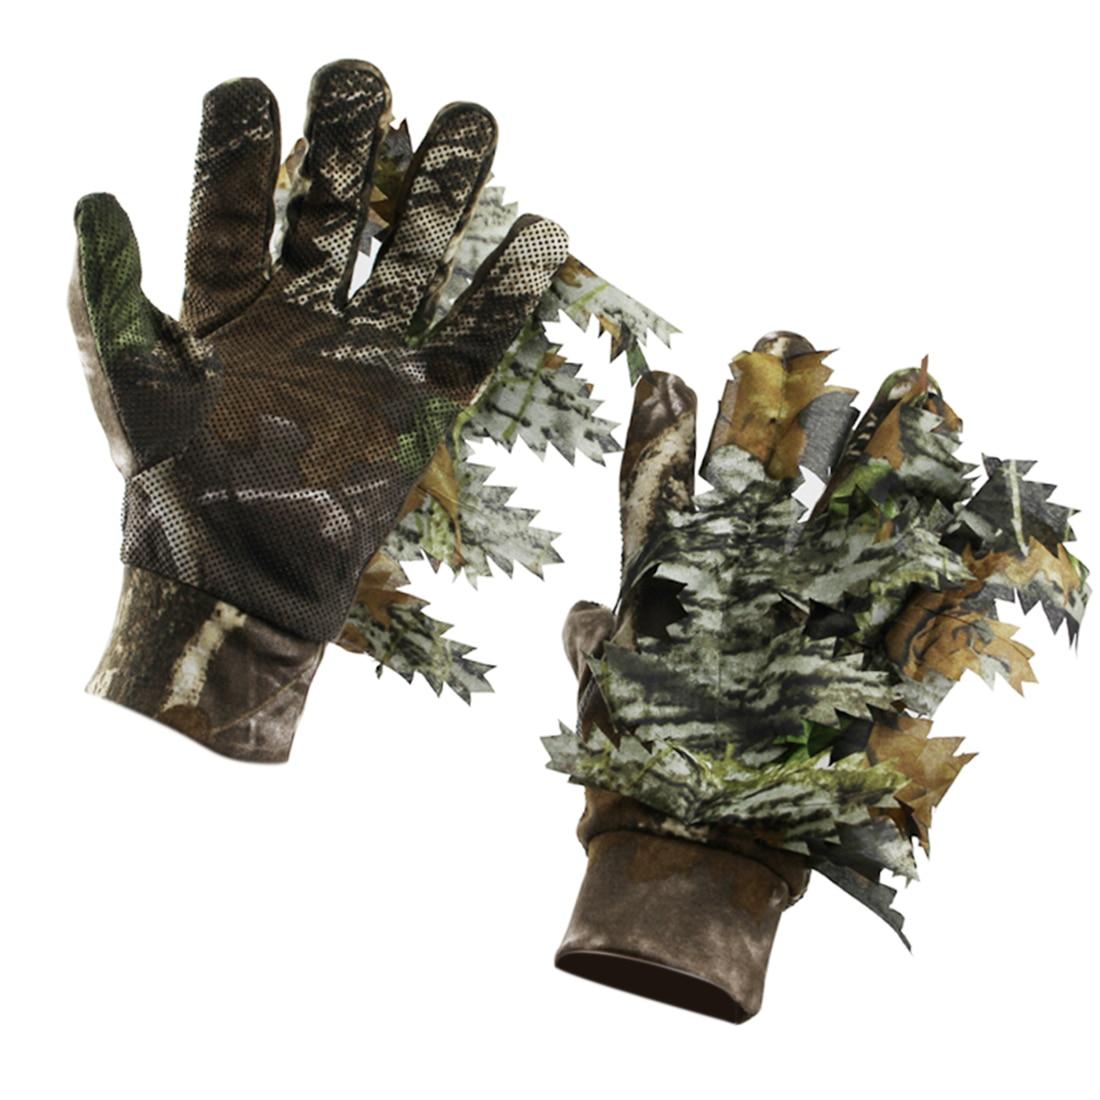 Nuevos guantes de camuflaje de hoja 3D MODIKER 2019, guantes de caza para exteriores, guantes antideslizantes con dedos completos, tamaño libre